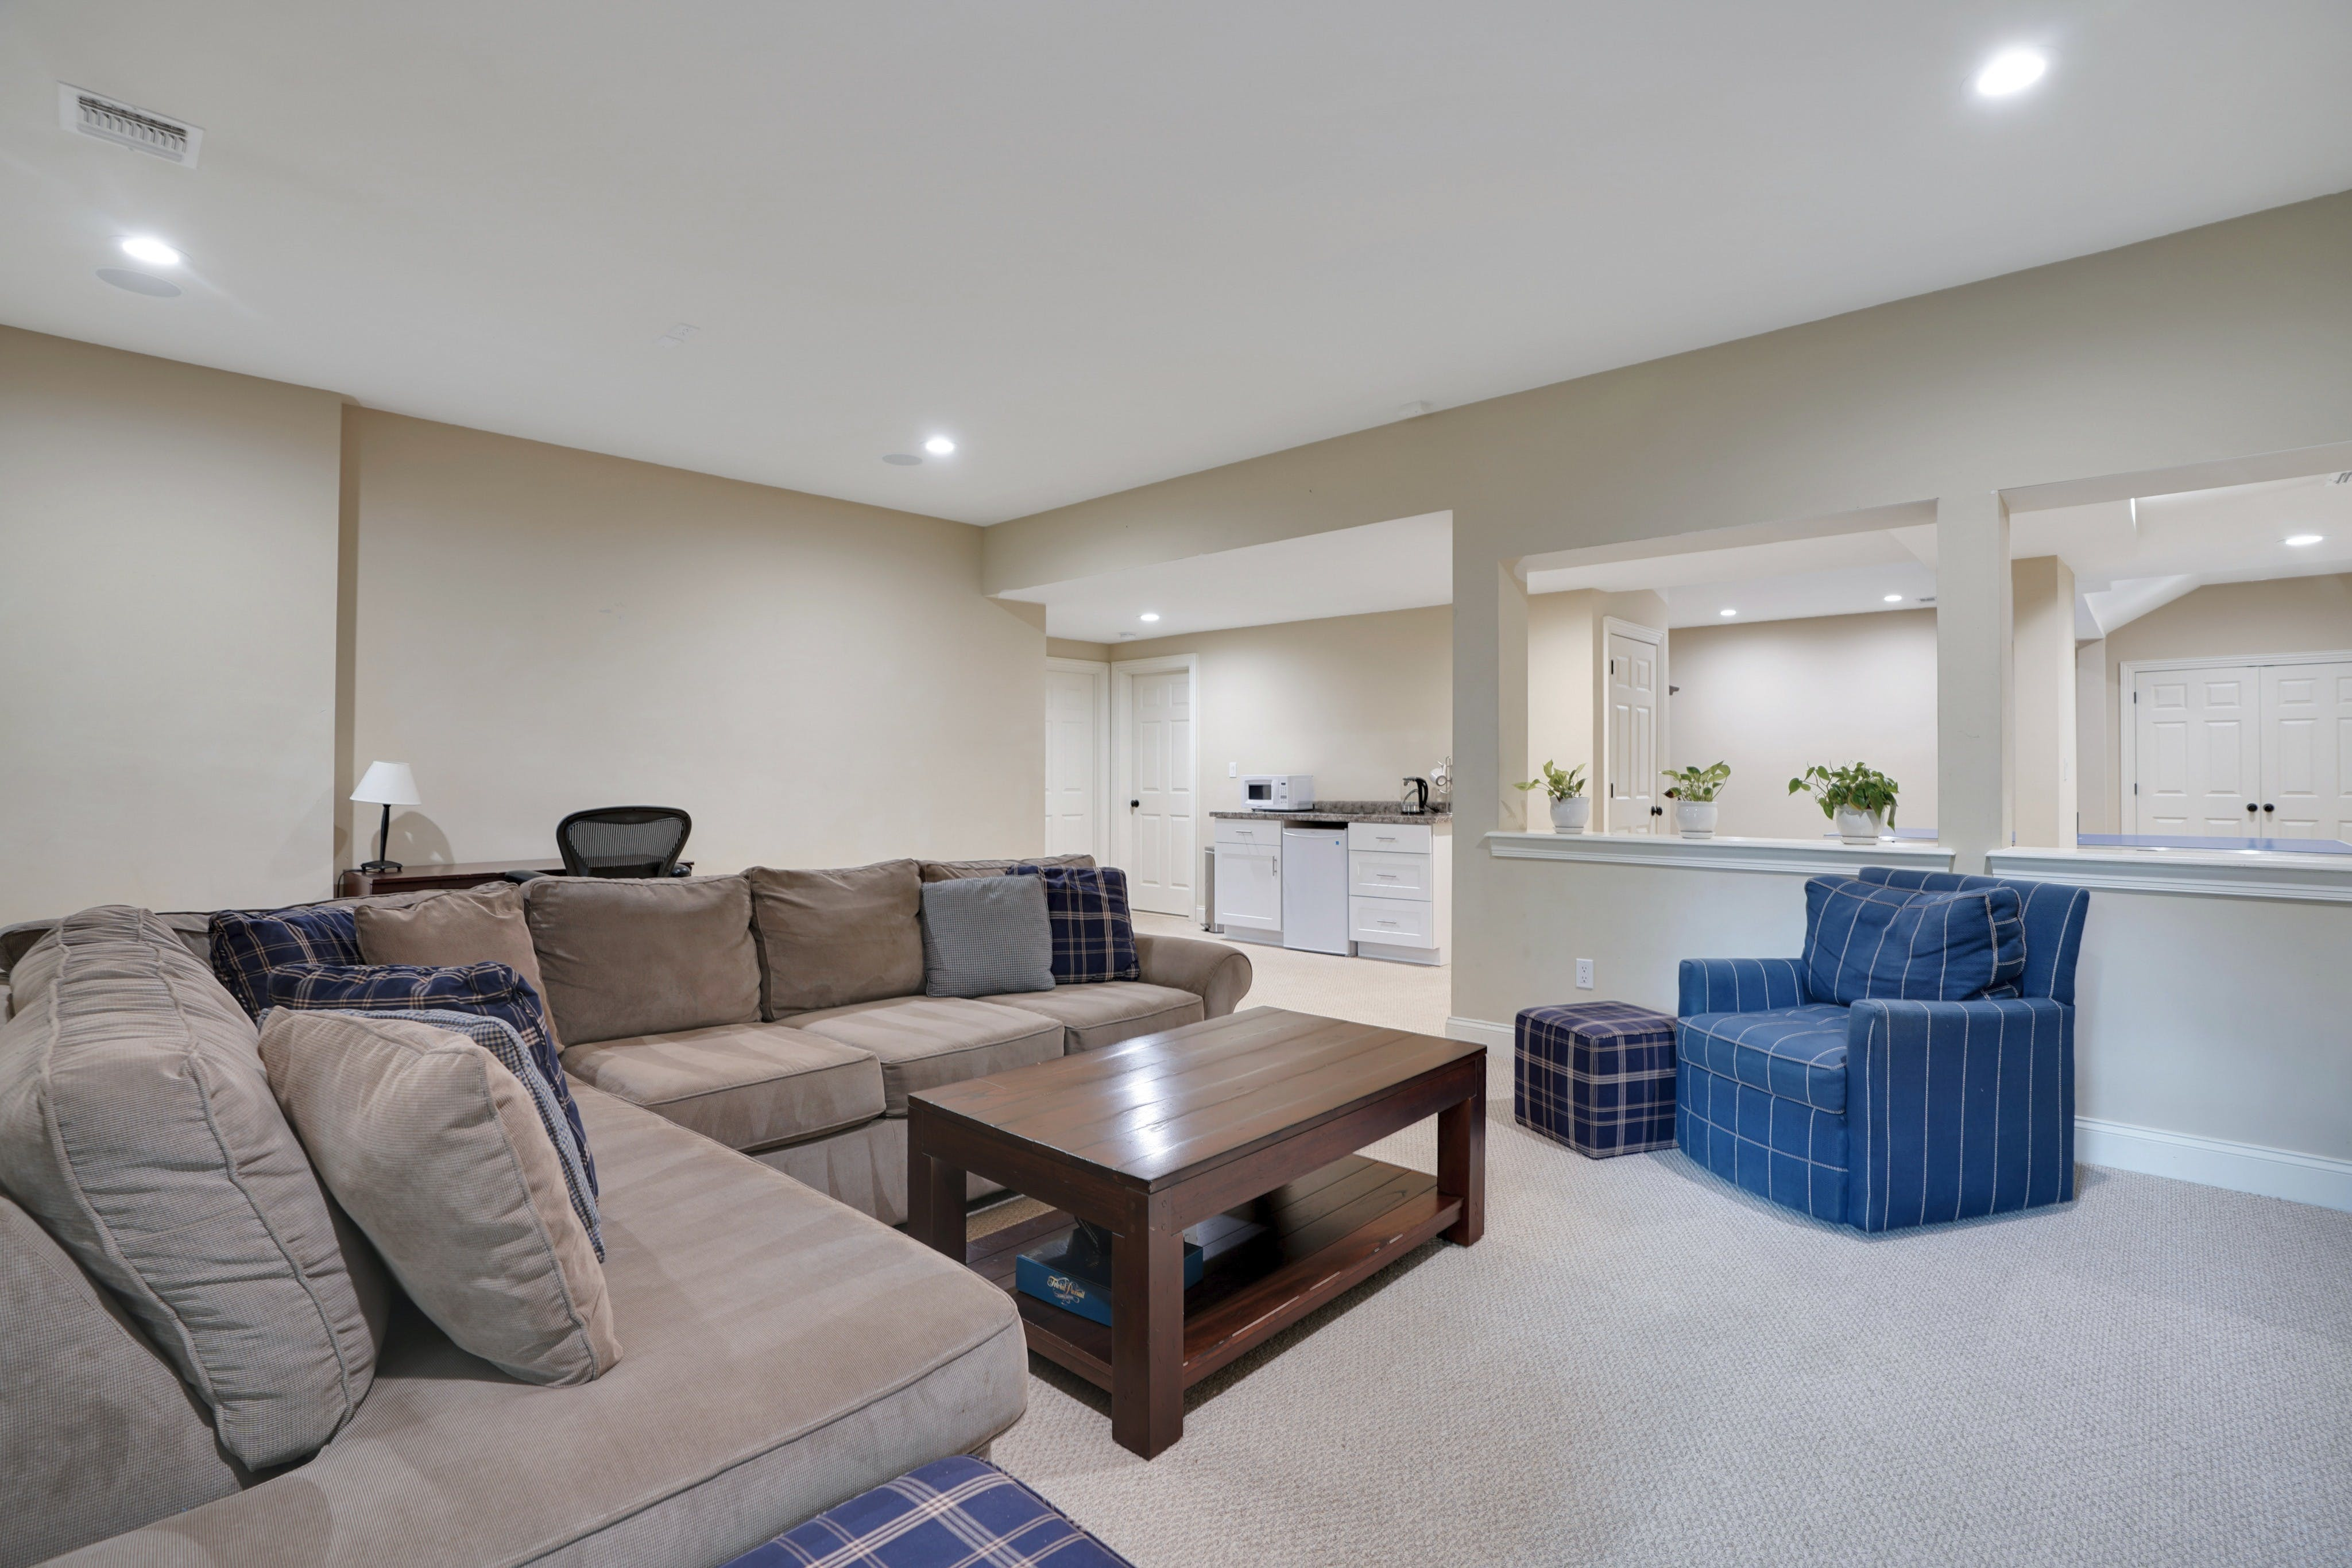 21 Saratoga Way - Recreation Room